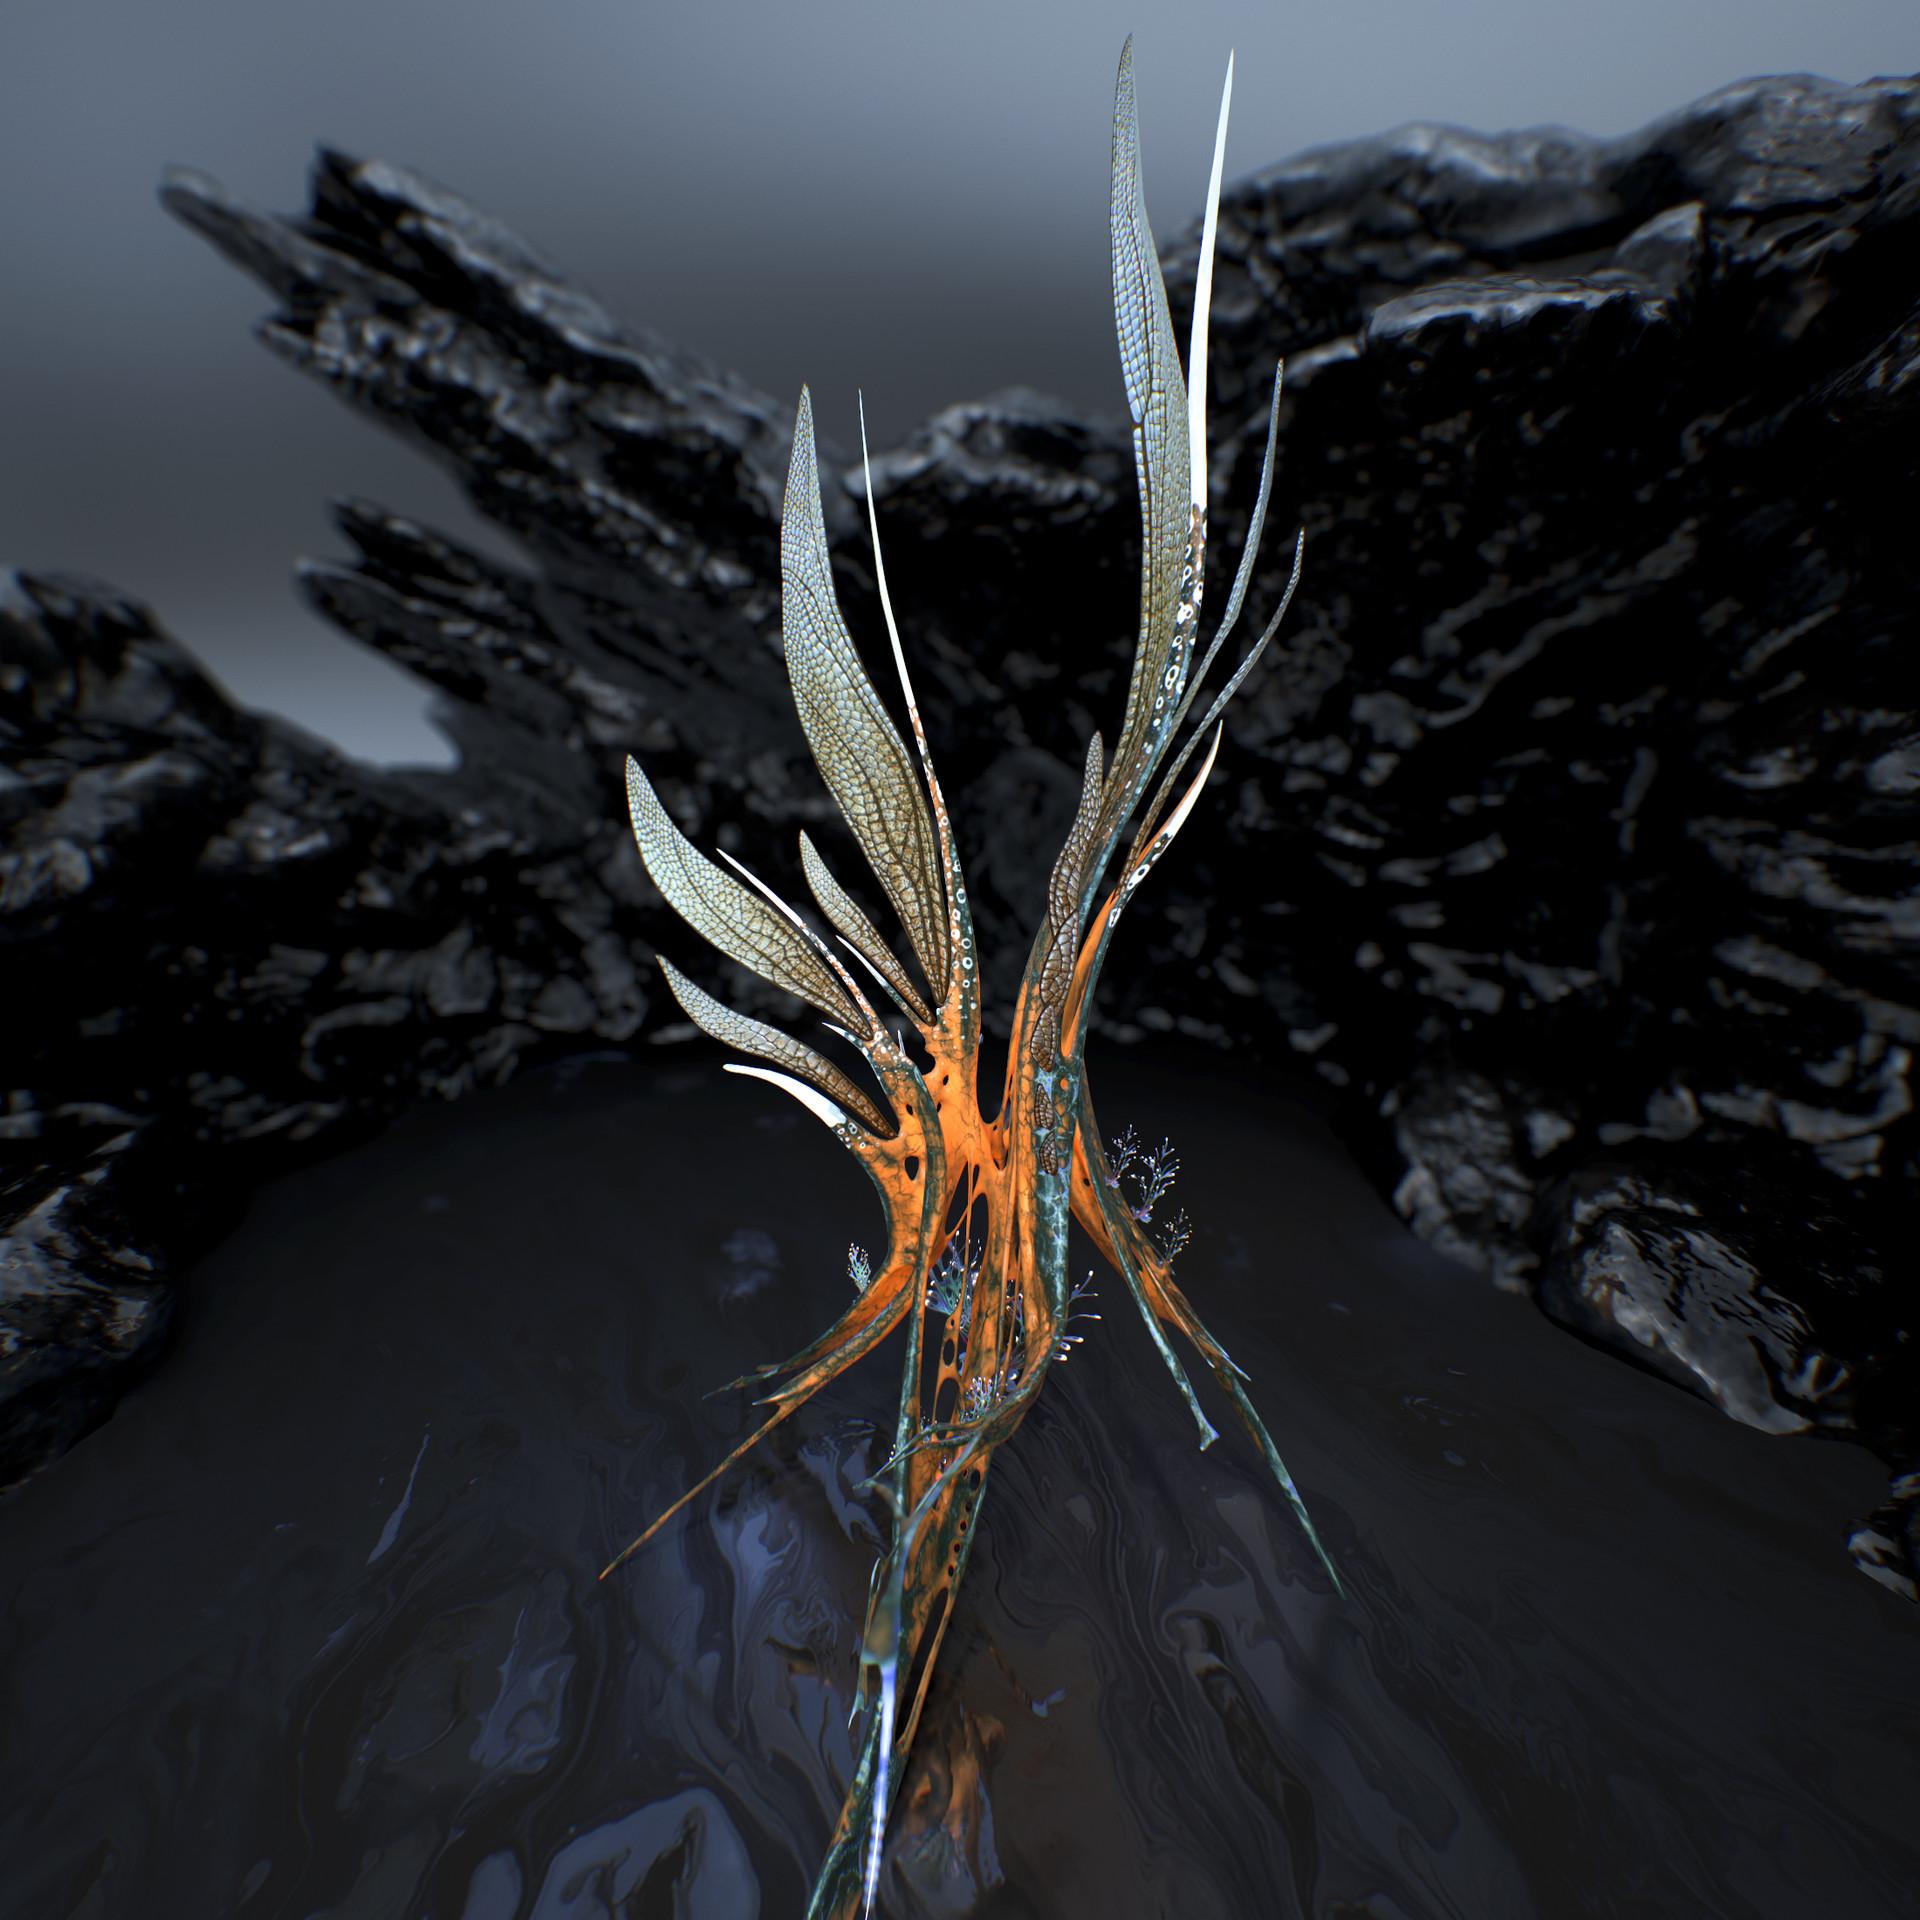 Johan de leenheer alien fern misota spletinus40